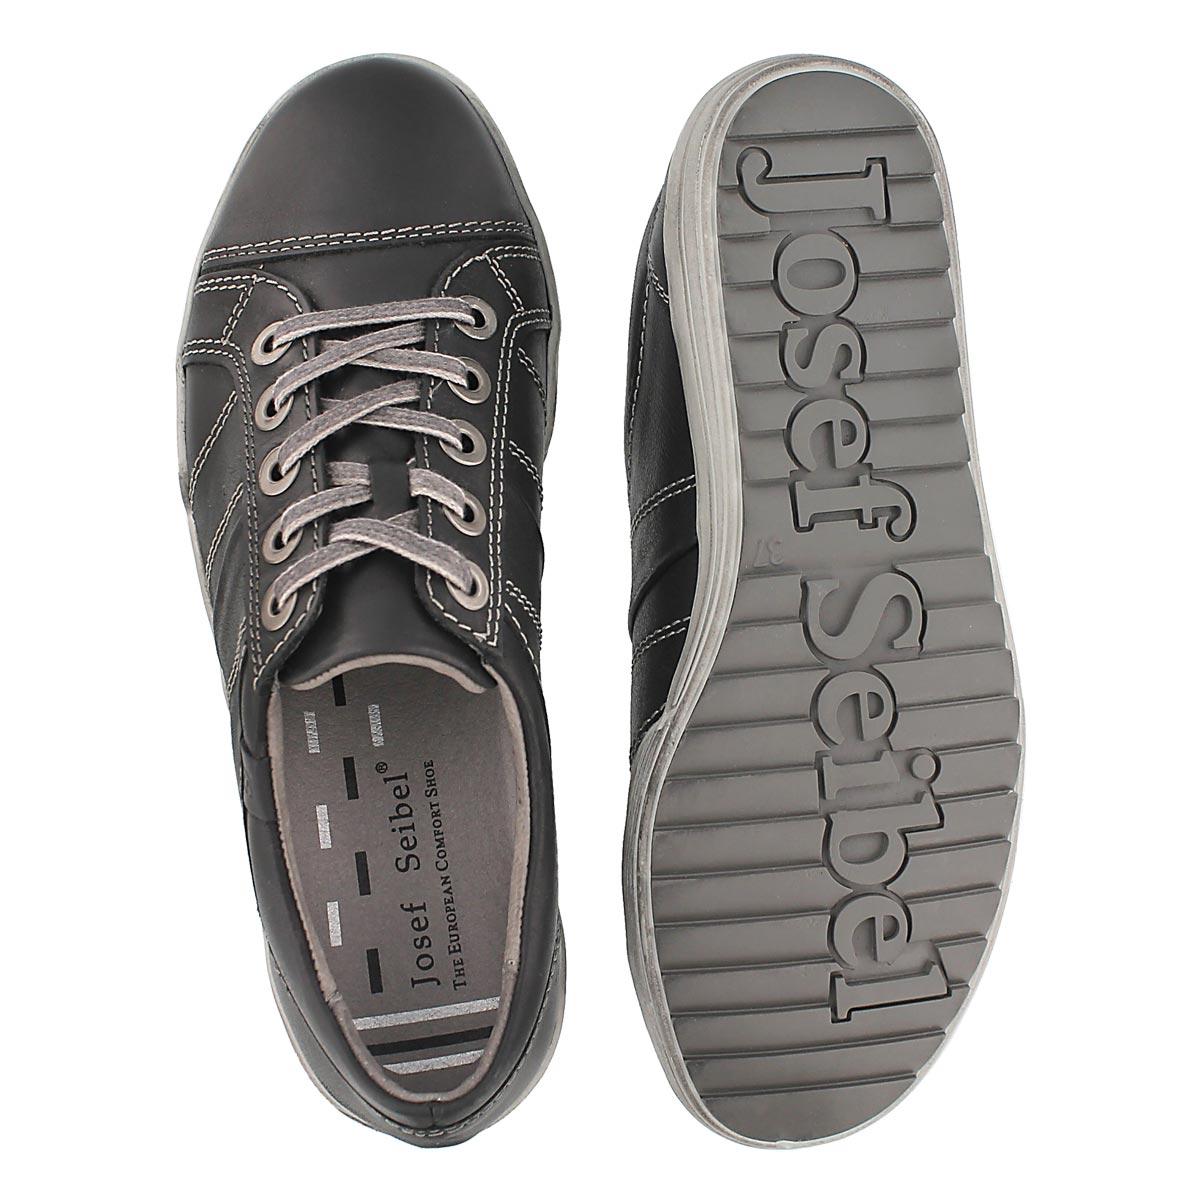 Lds Dany 05 blk lthr oxford sneaker